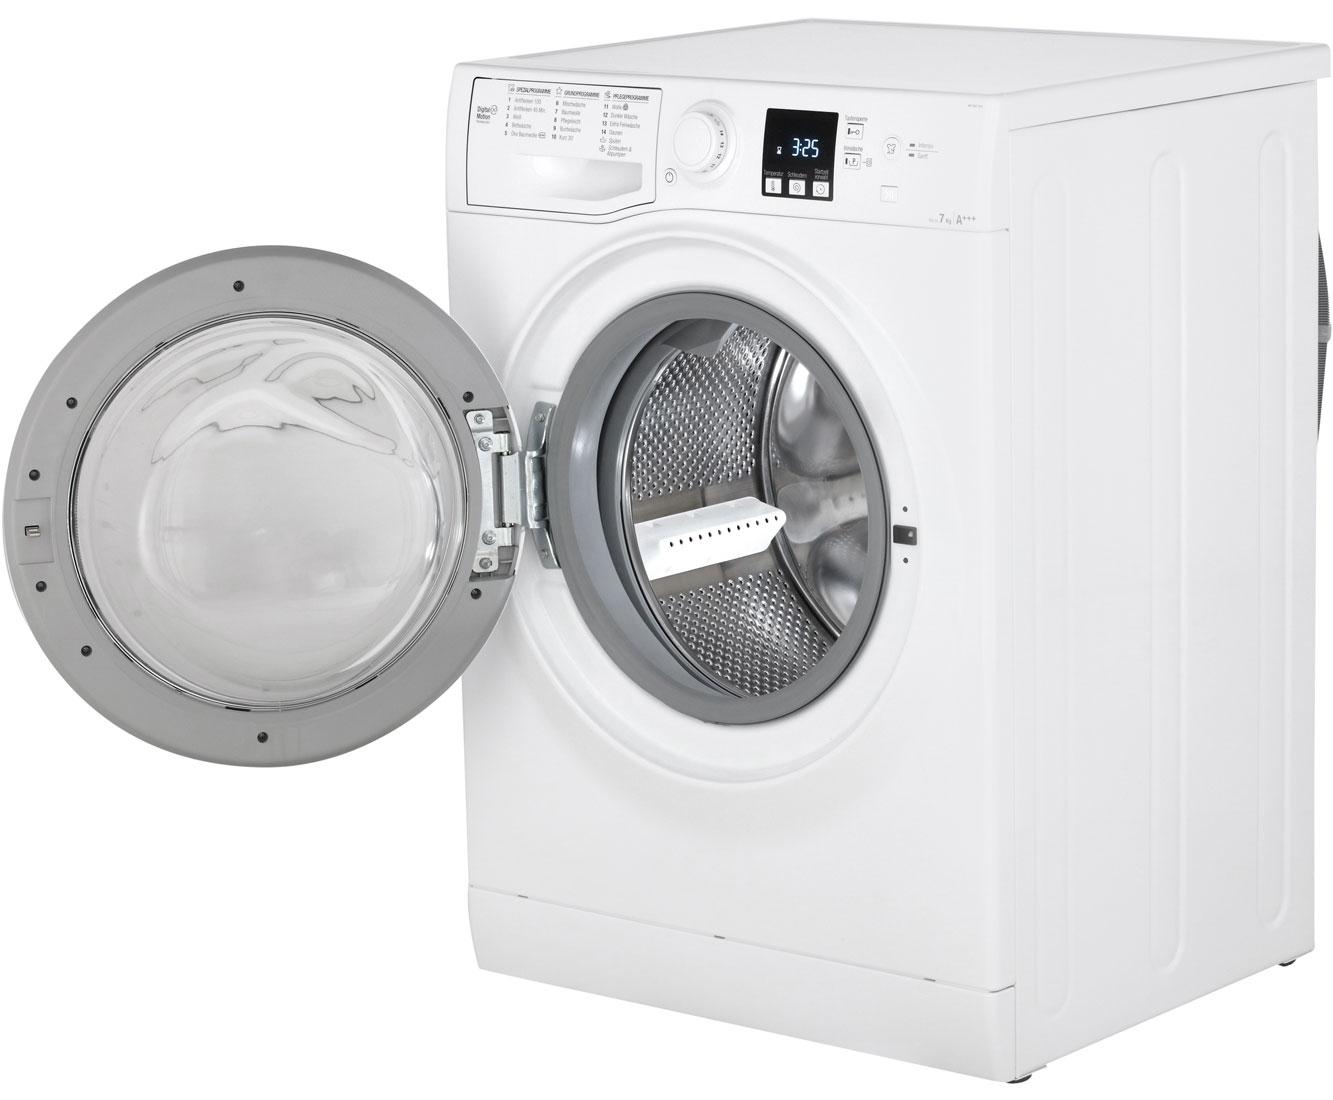 Bauknecht wa soft 7f41 waschmaschine freistehend weiss neu ebay